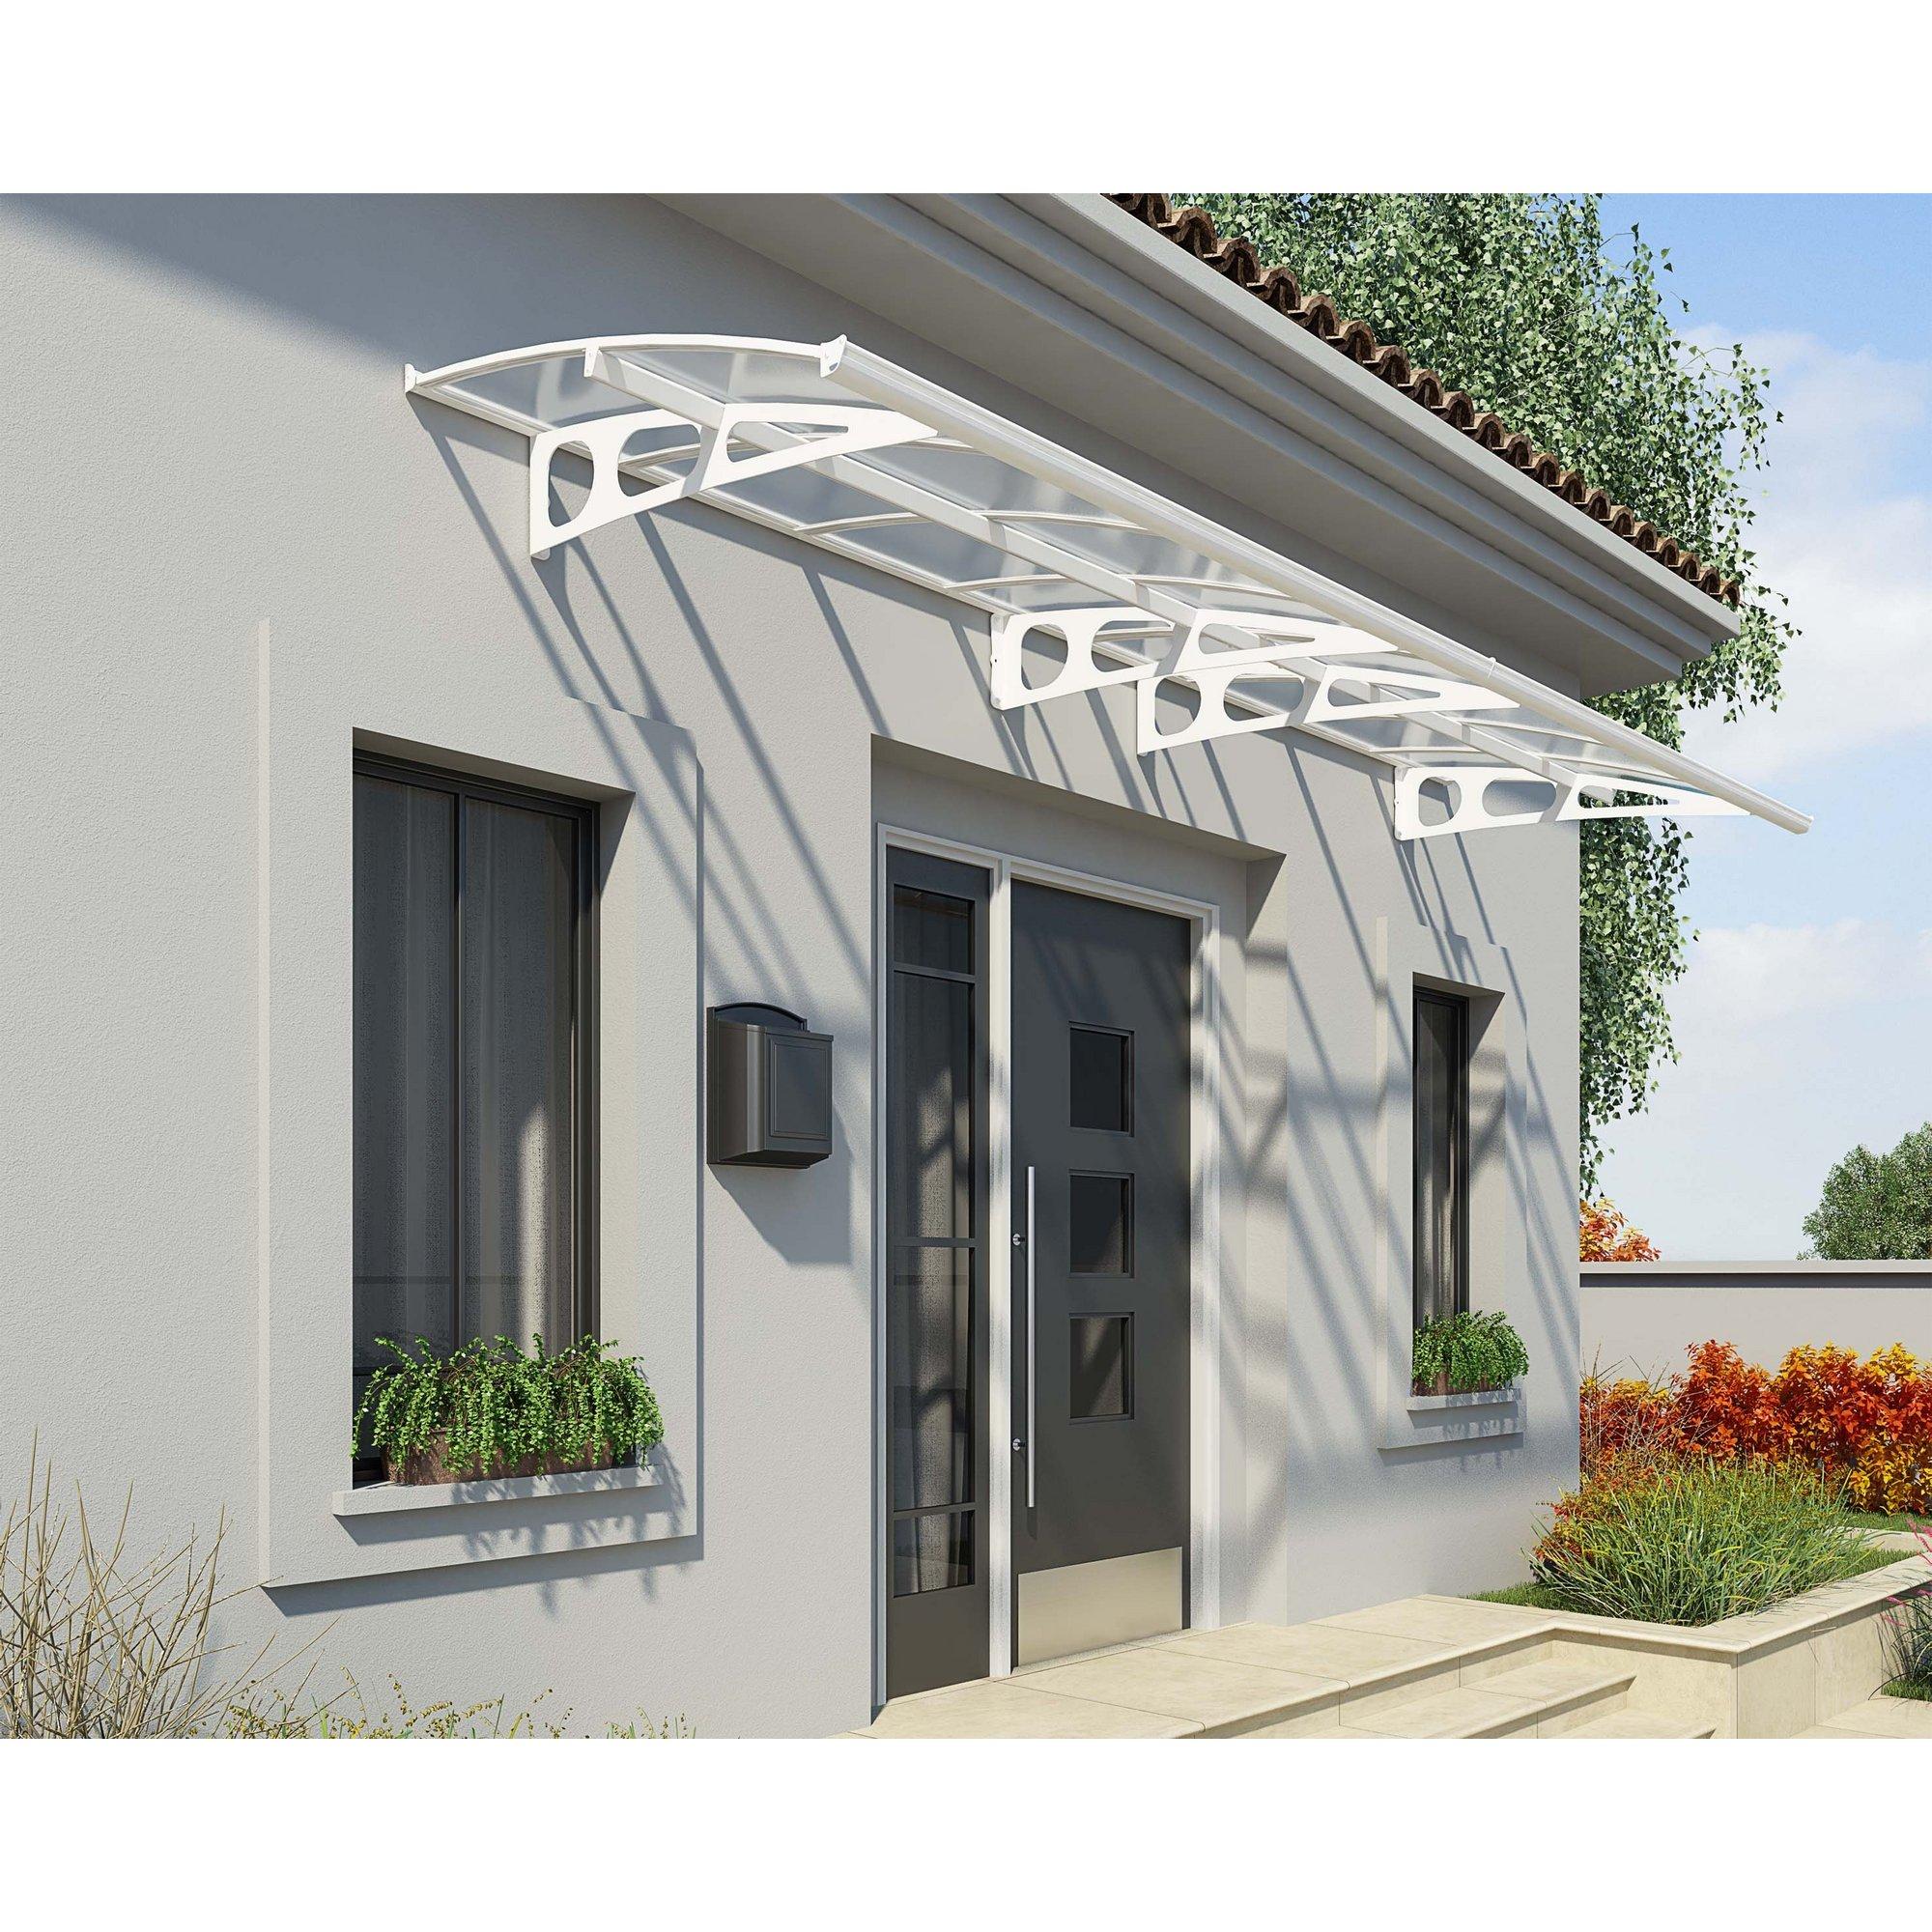 Image of Canopy Bordeaux 4.4m